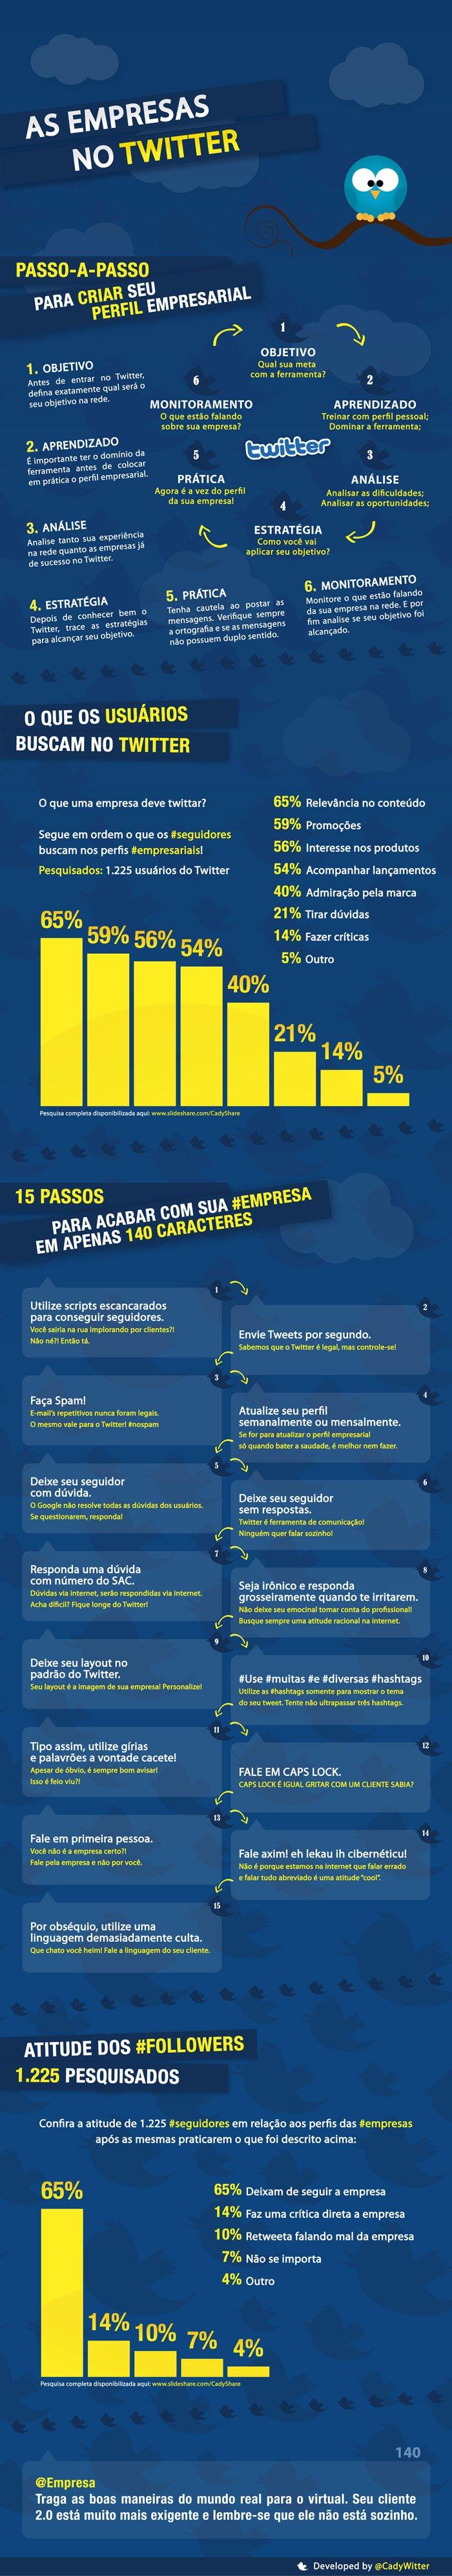 infografico-empresas-twitter